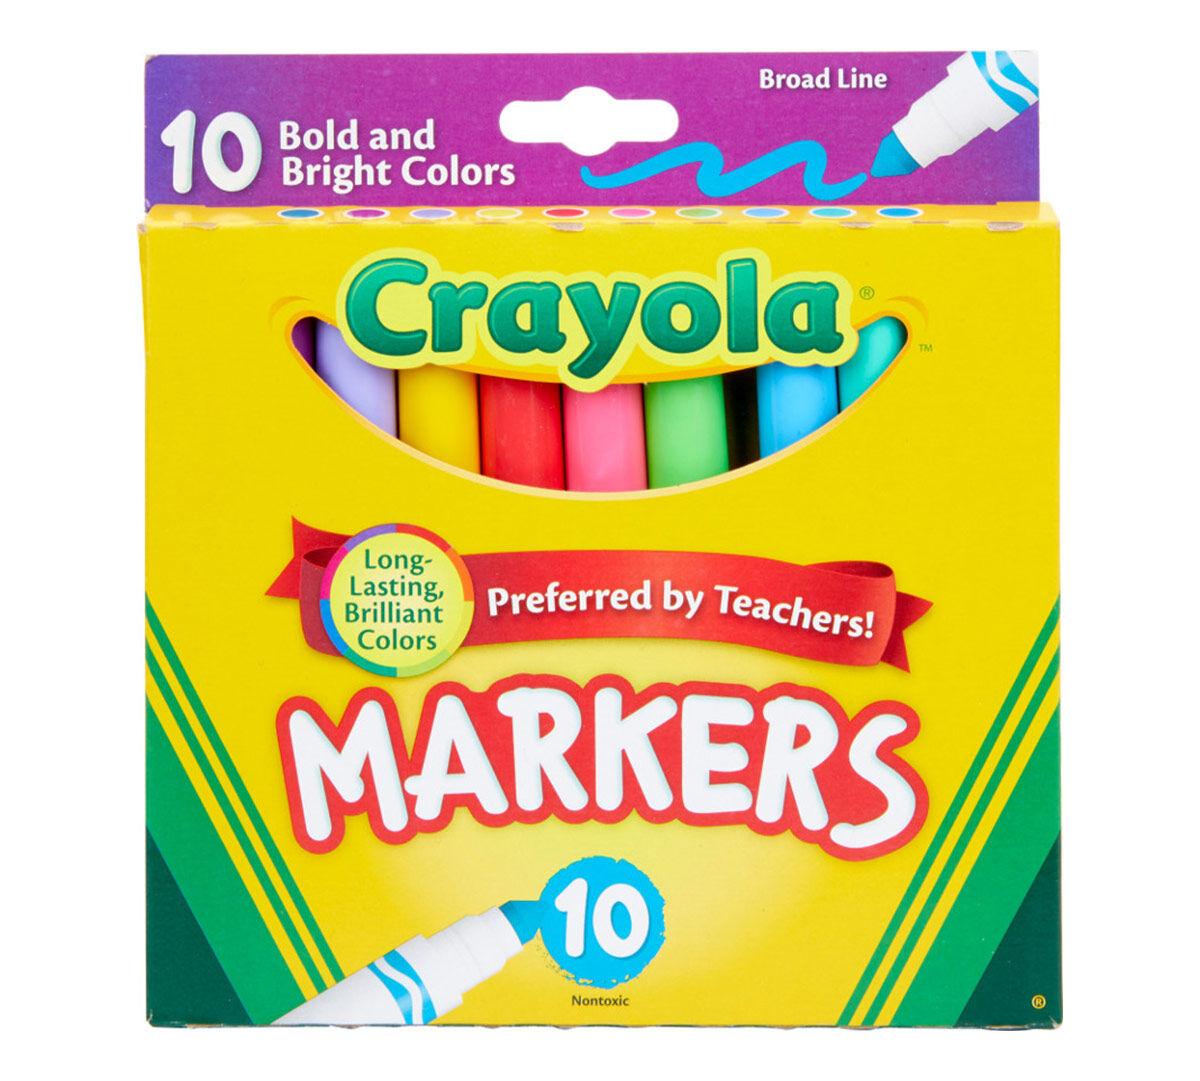 Washable Broadline Markers Rainbow Colors 10 Markers//Pack